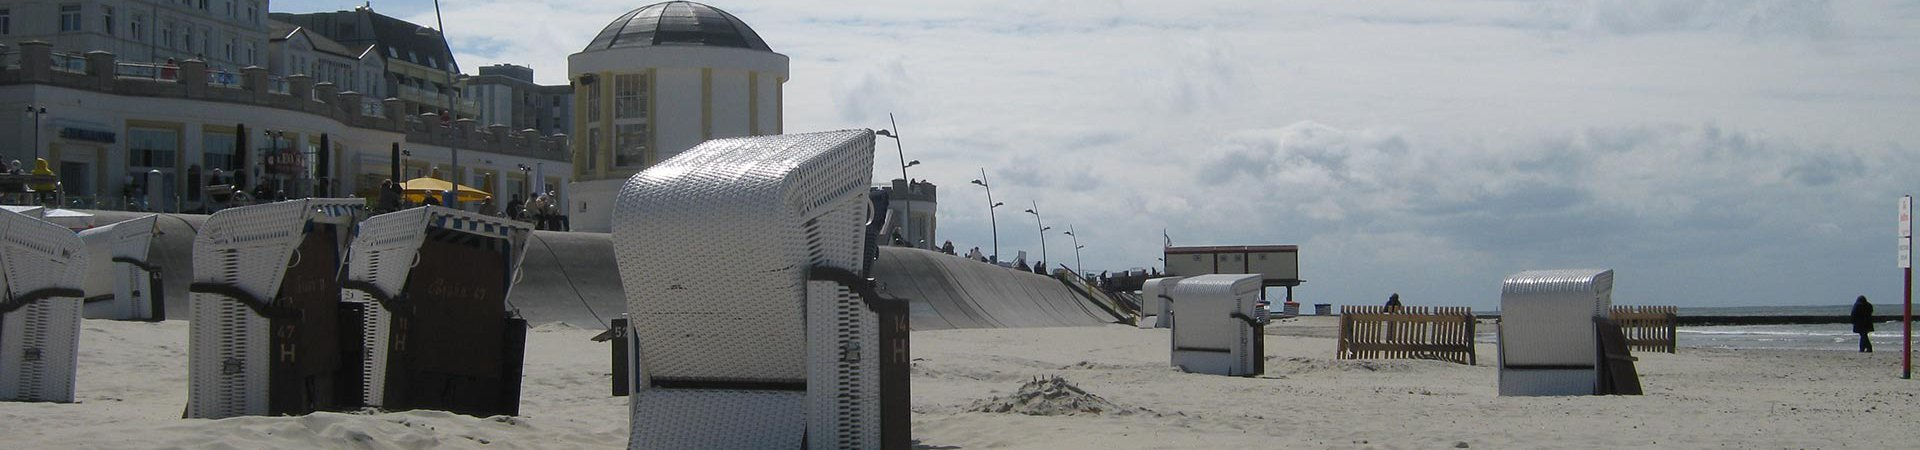 Strand op Borkum - Waddenribtochten - Borkum Boulevard